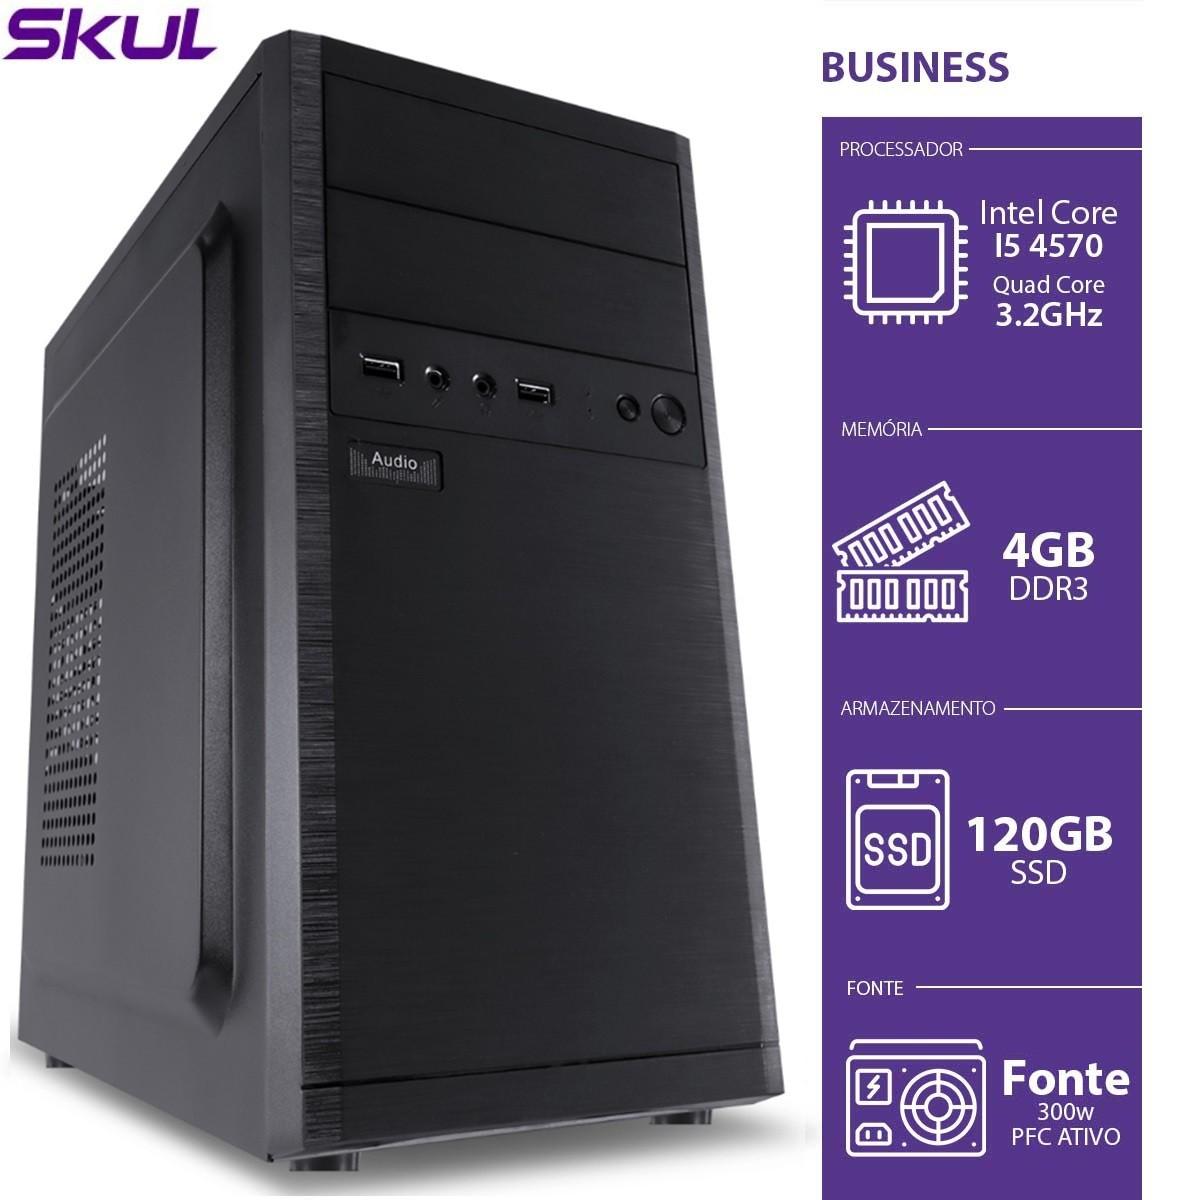 Computador Business B500 - I5-4570 3.2GHZ 4GB DDR3 SSD 120GB HDMI/VGA Fonte 300W PFC Ativo